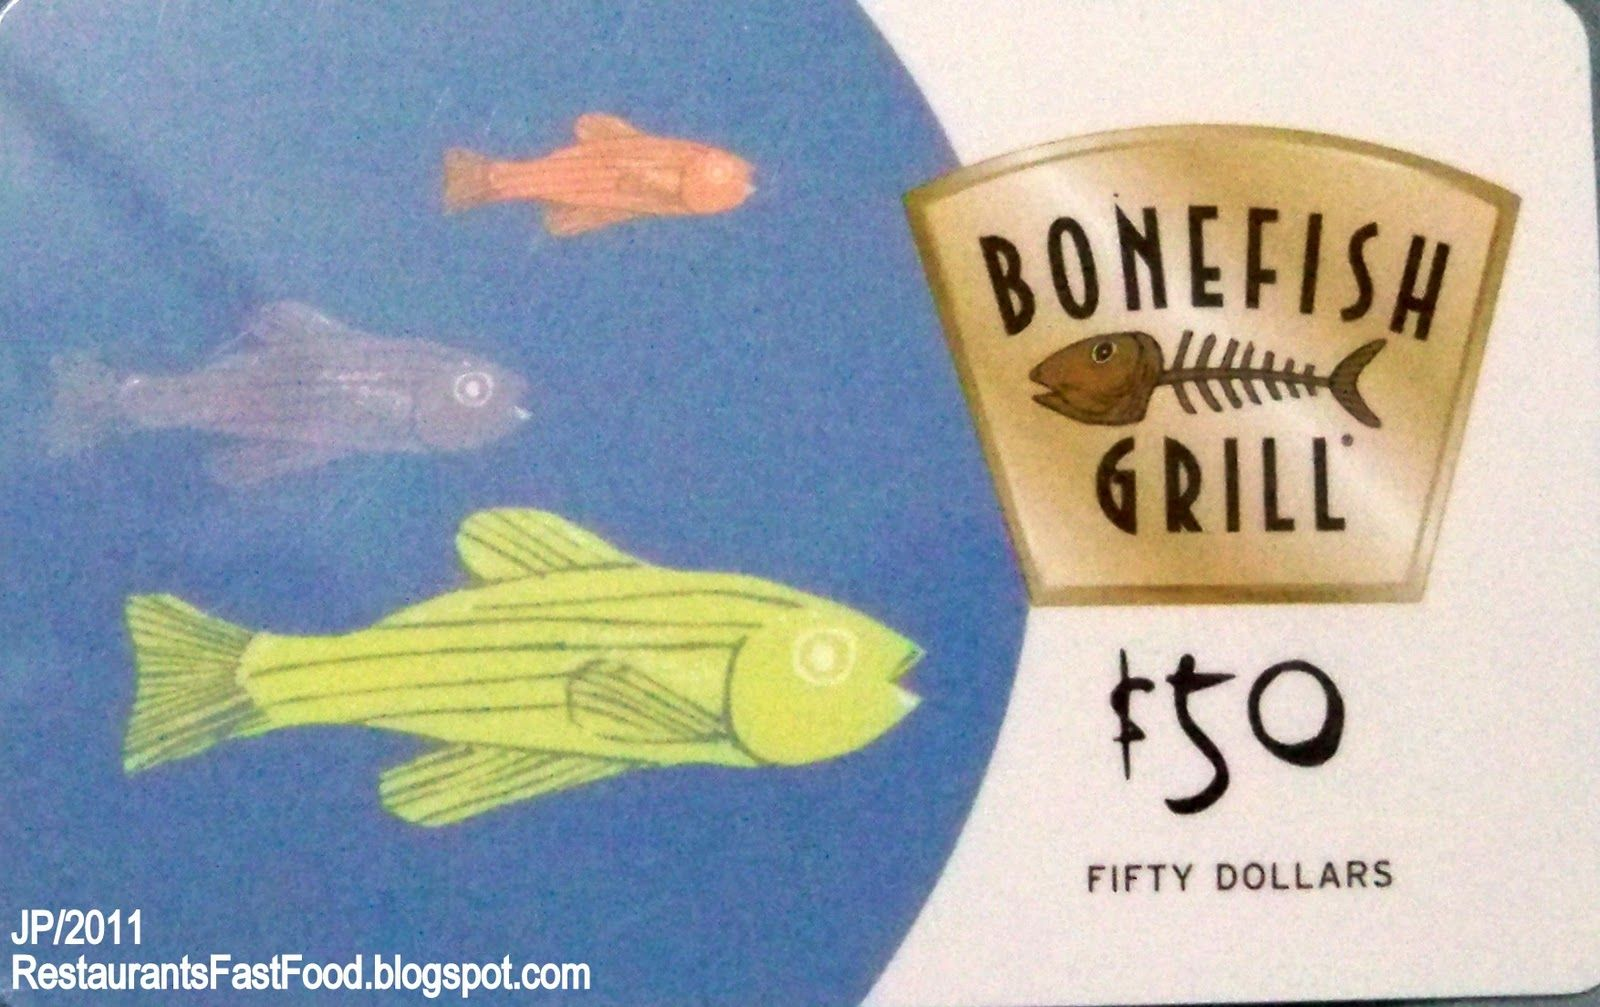 Bonefish grill gift card balance check bonefish grill